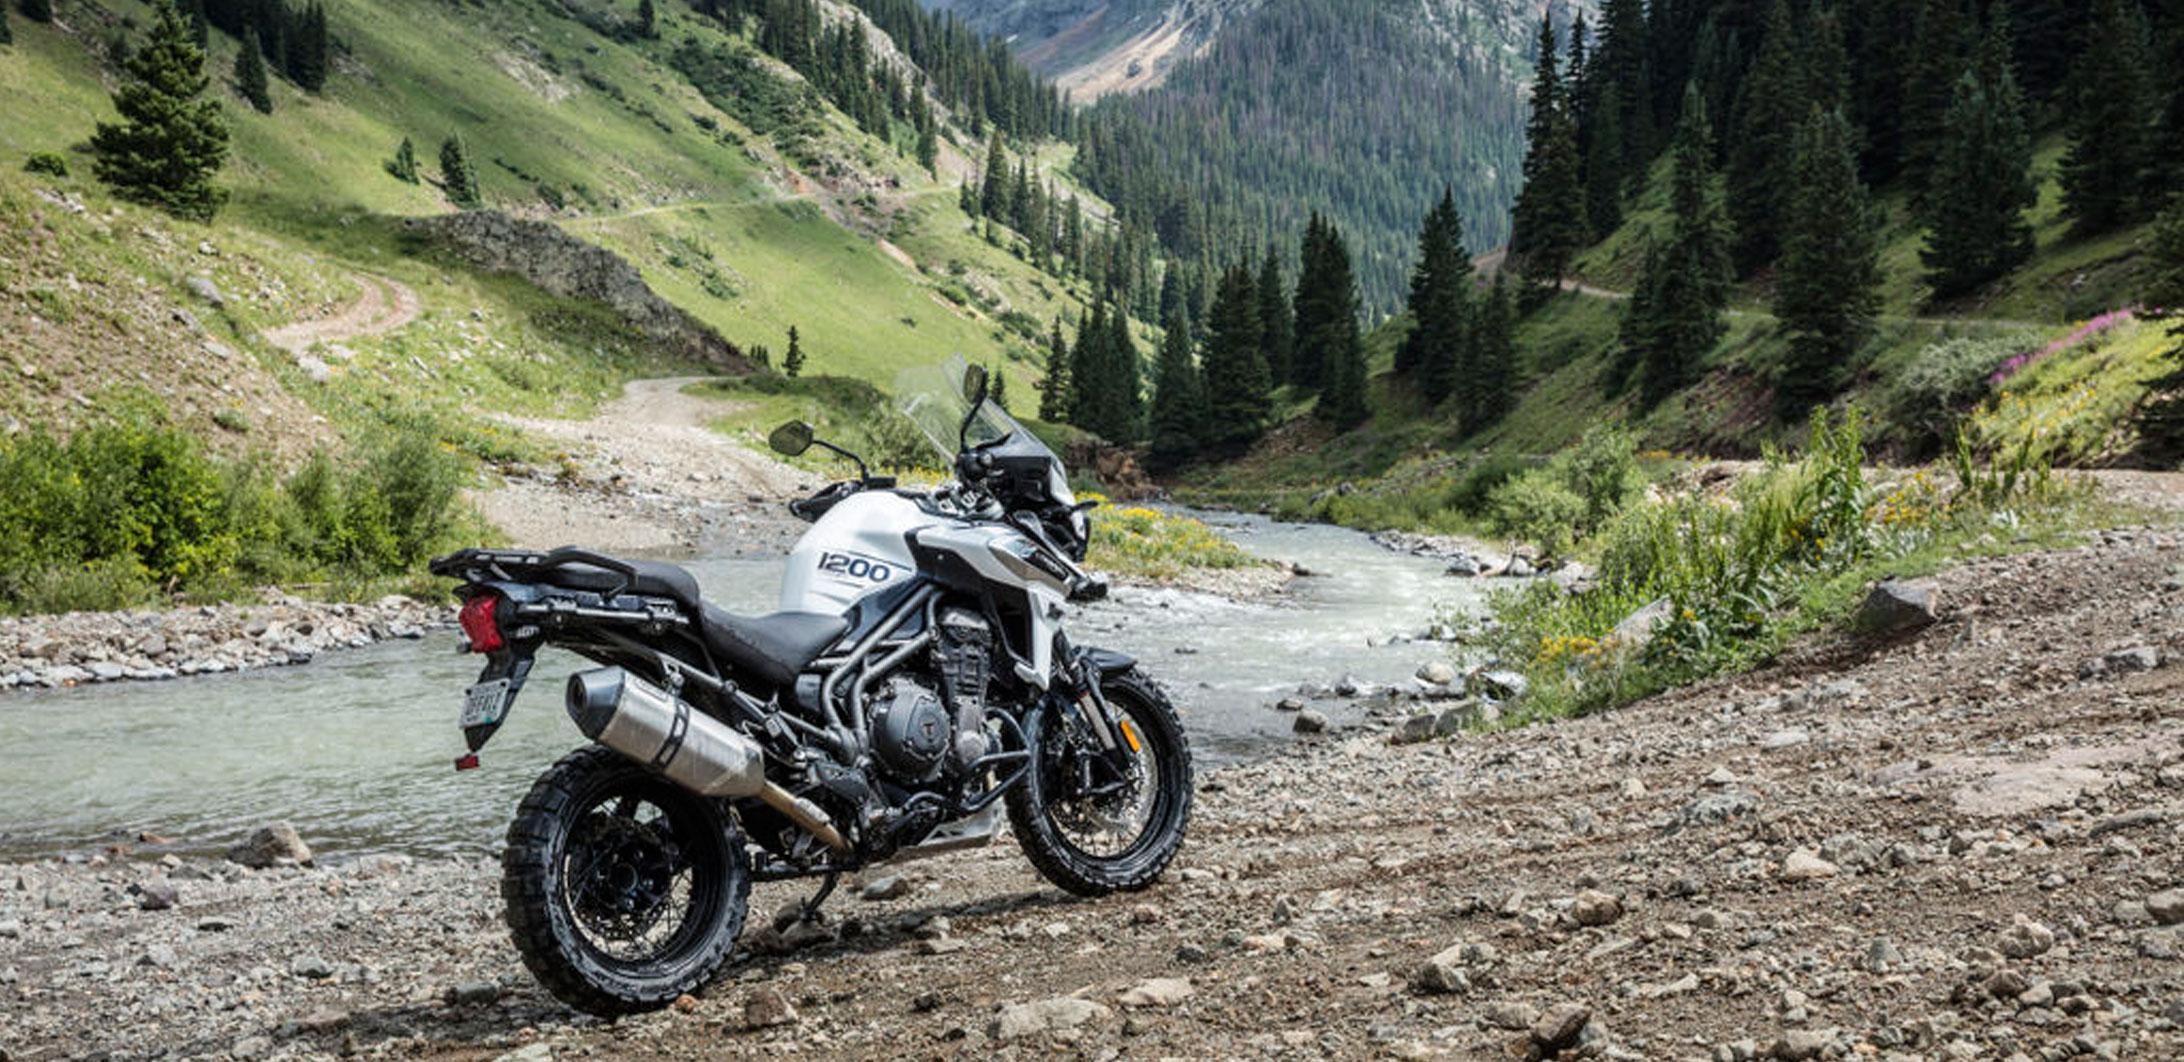 tiger 1200 moto montreal